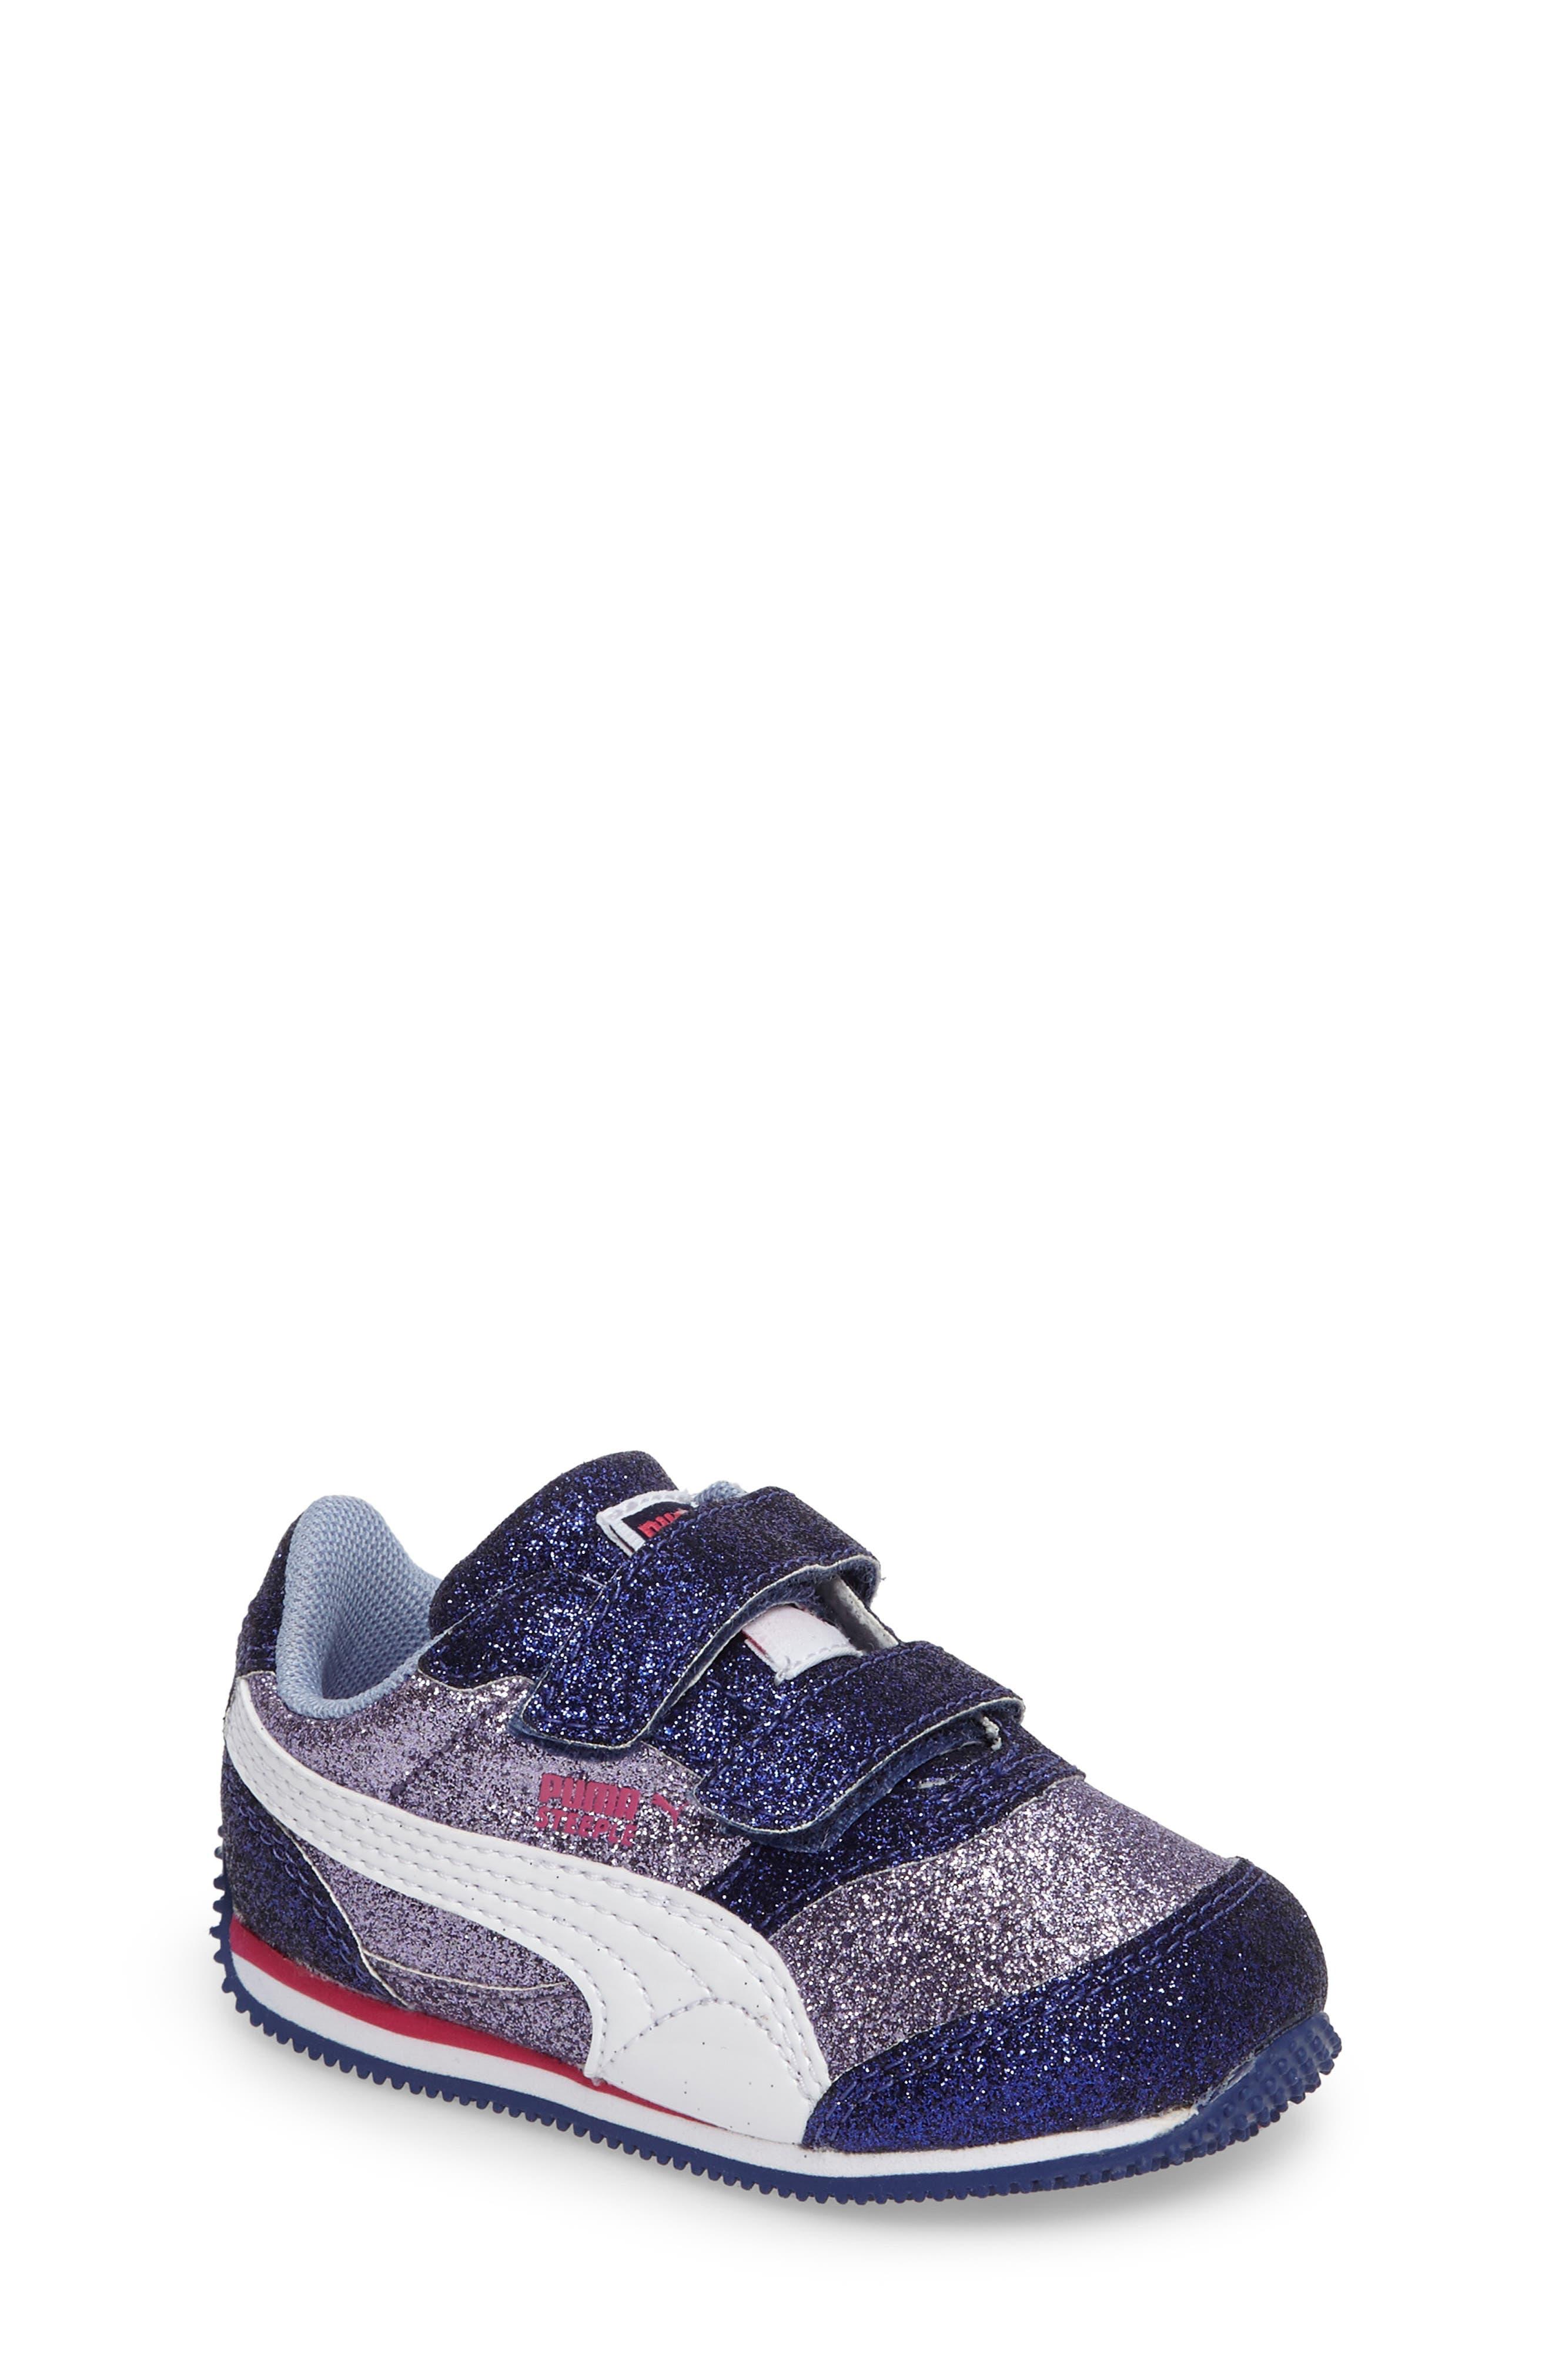 Steeple Glitz Glam Sneaker,                             Main thumbnail 1, color,                             Lavender